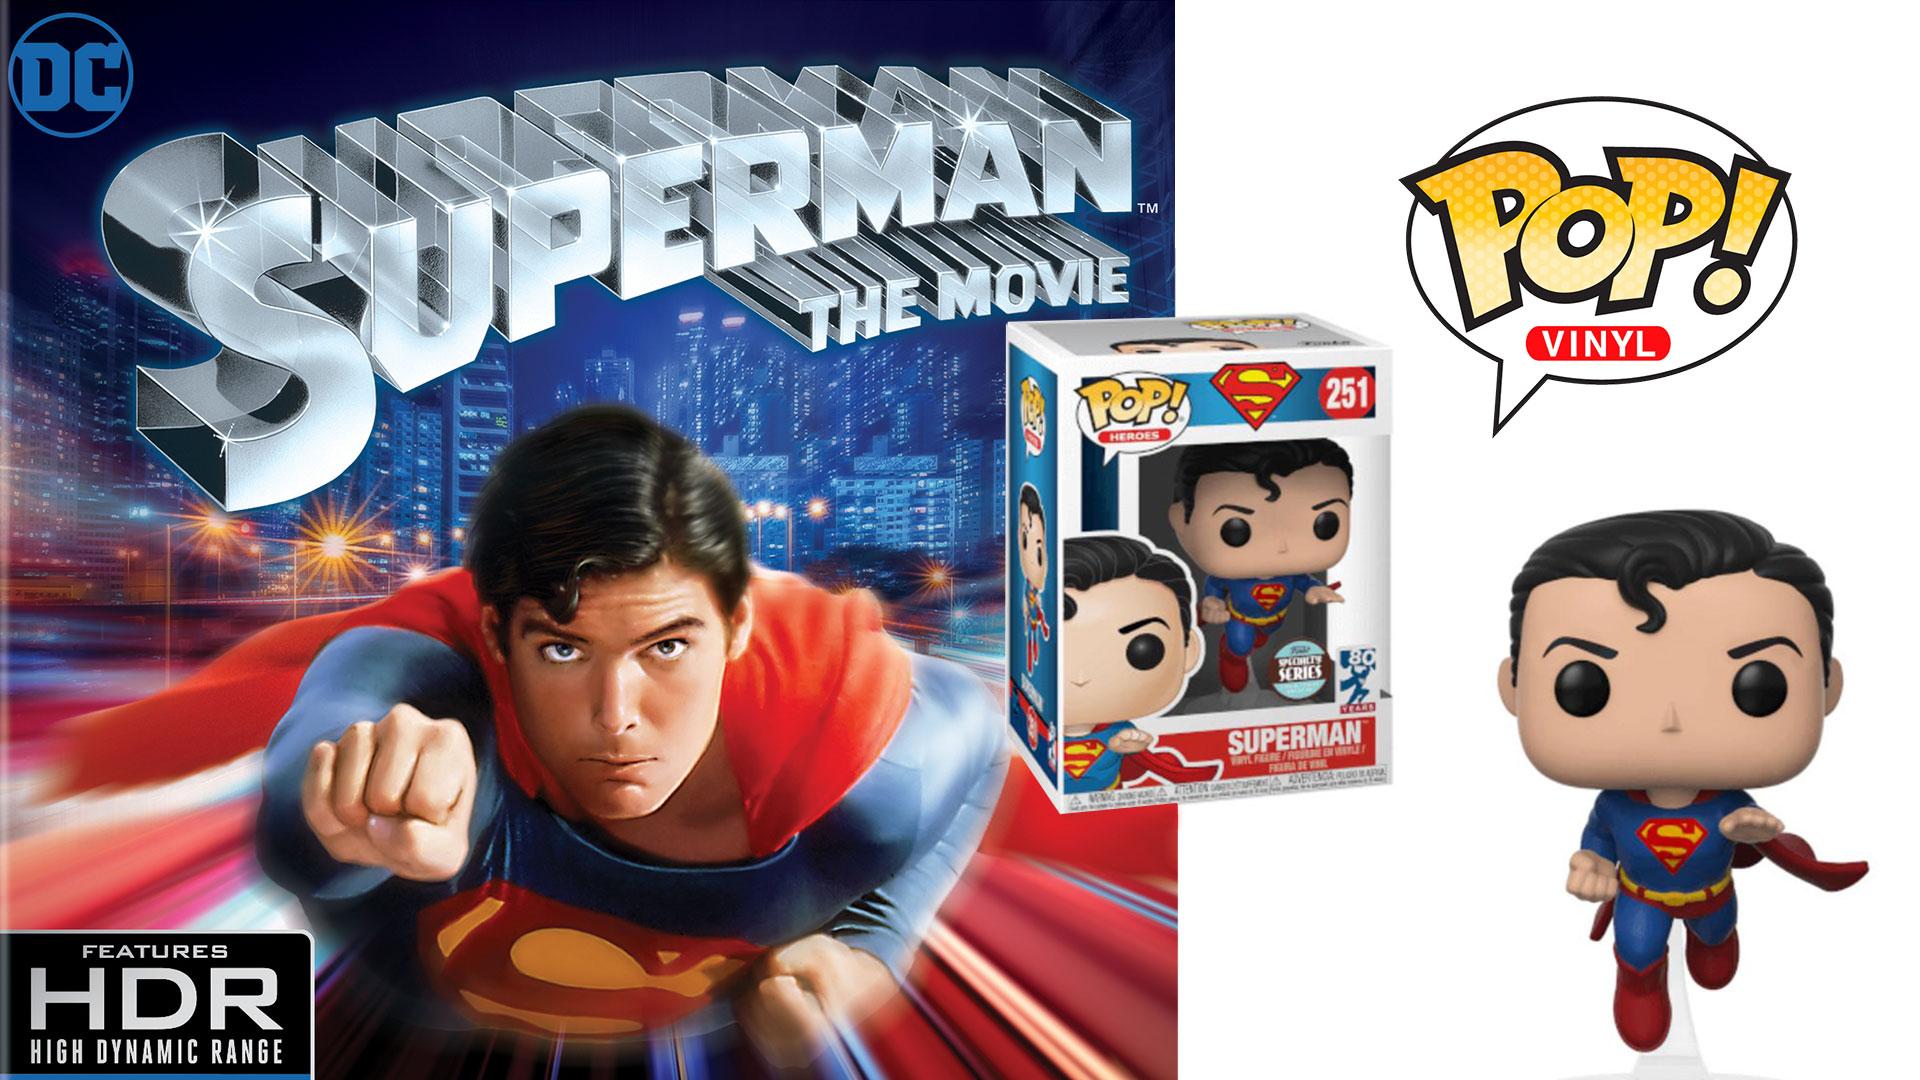 Superman The Movie 4K UHD Blu-ray